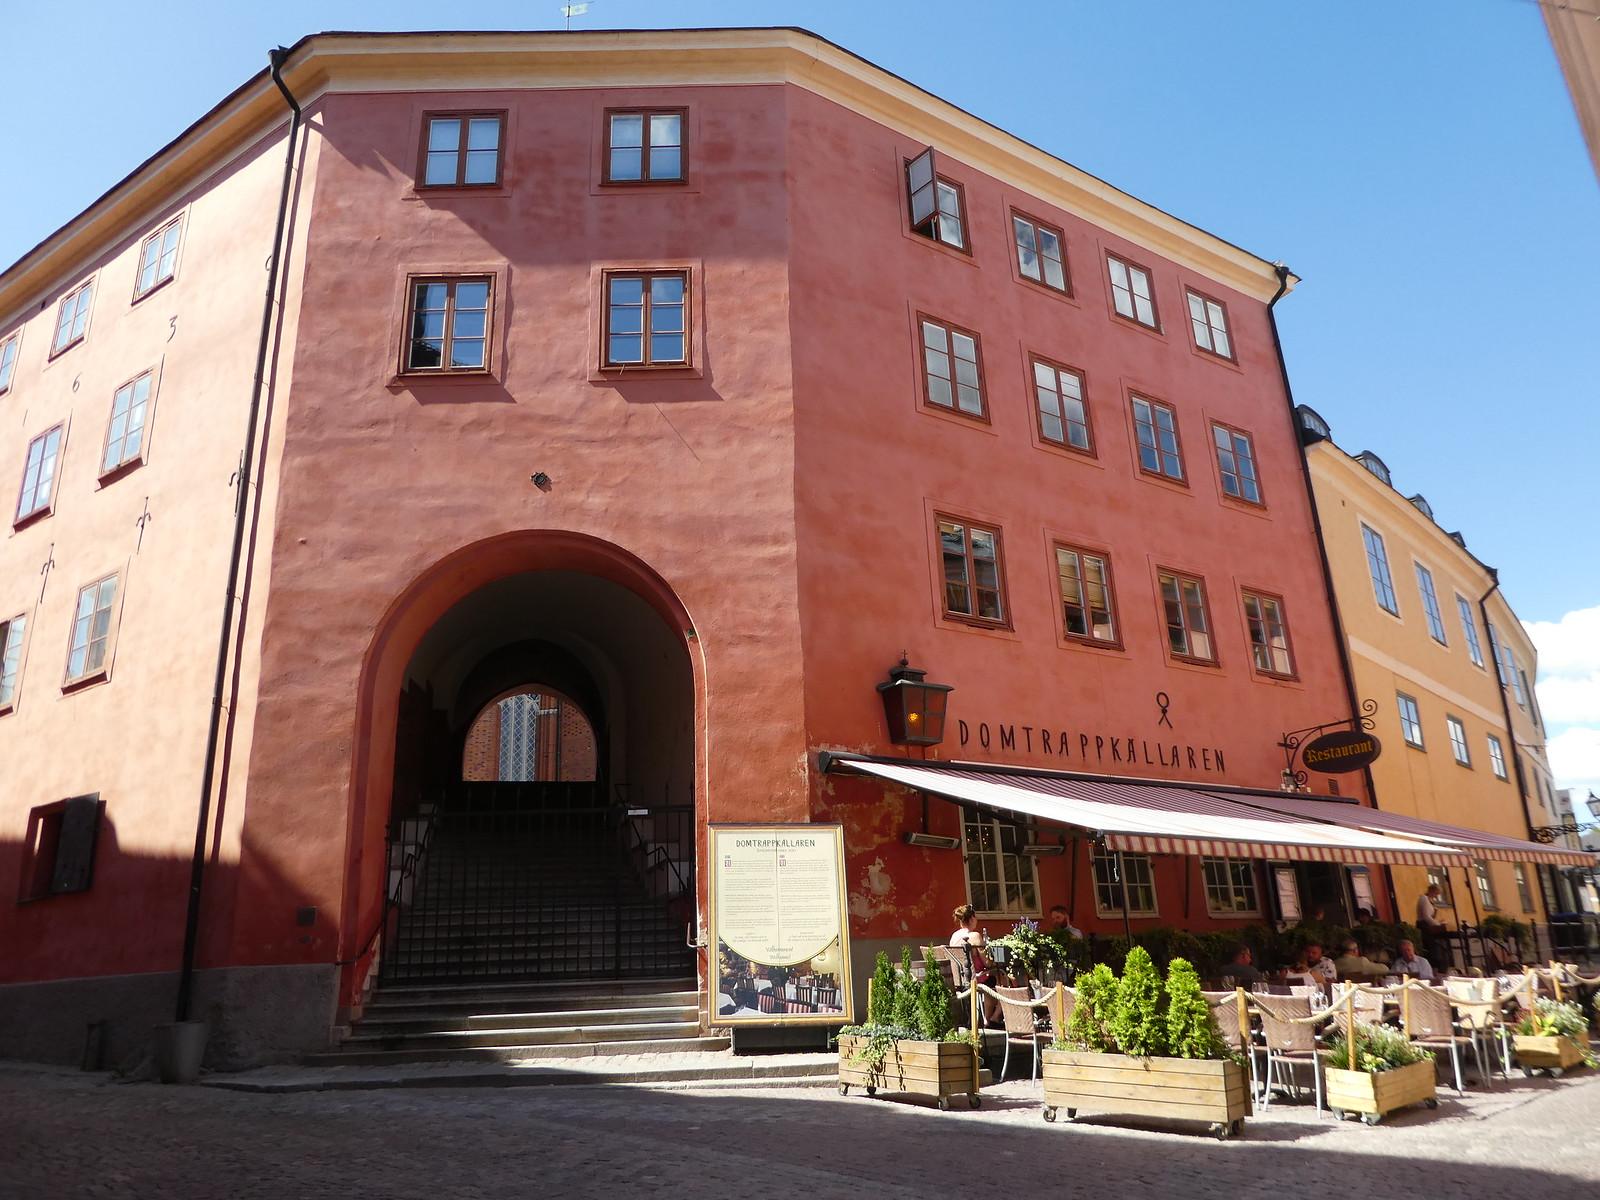 Domtrappkällaren Restaurant, Uppsala